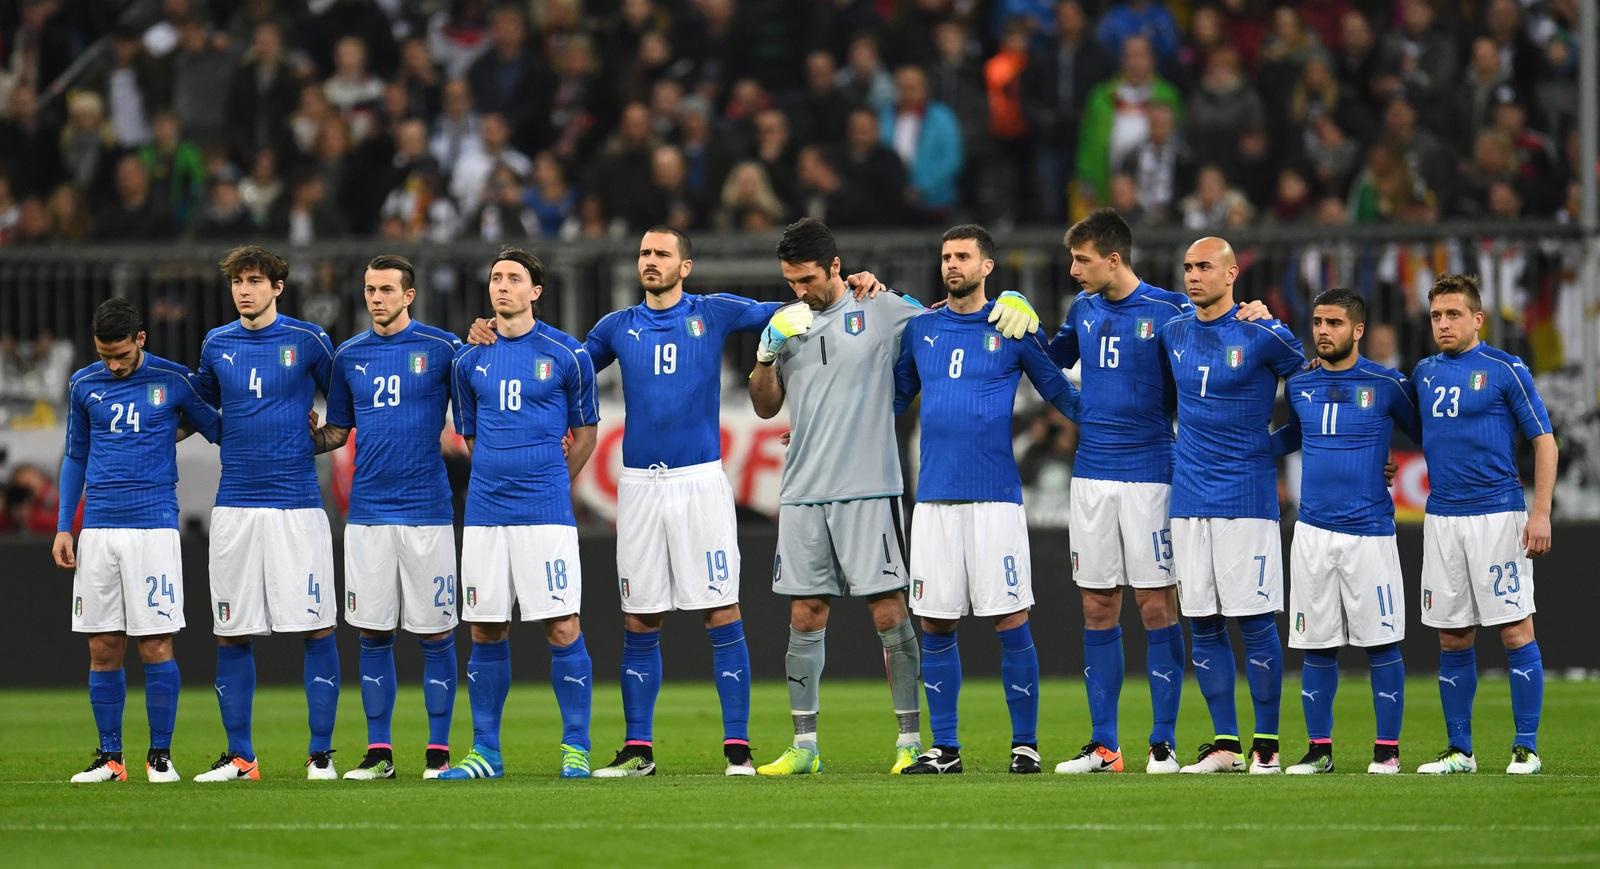 Wann Hat Italien Gegen Deutschland Gewonnen